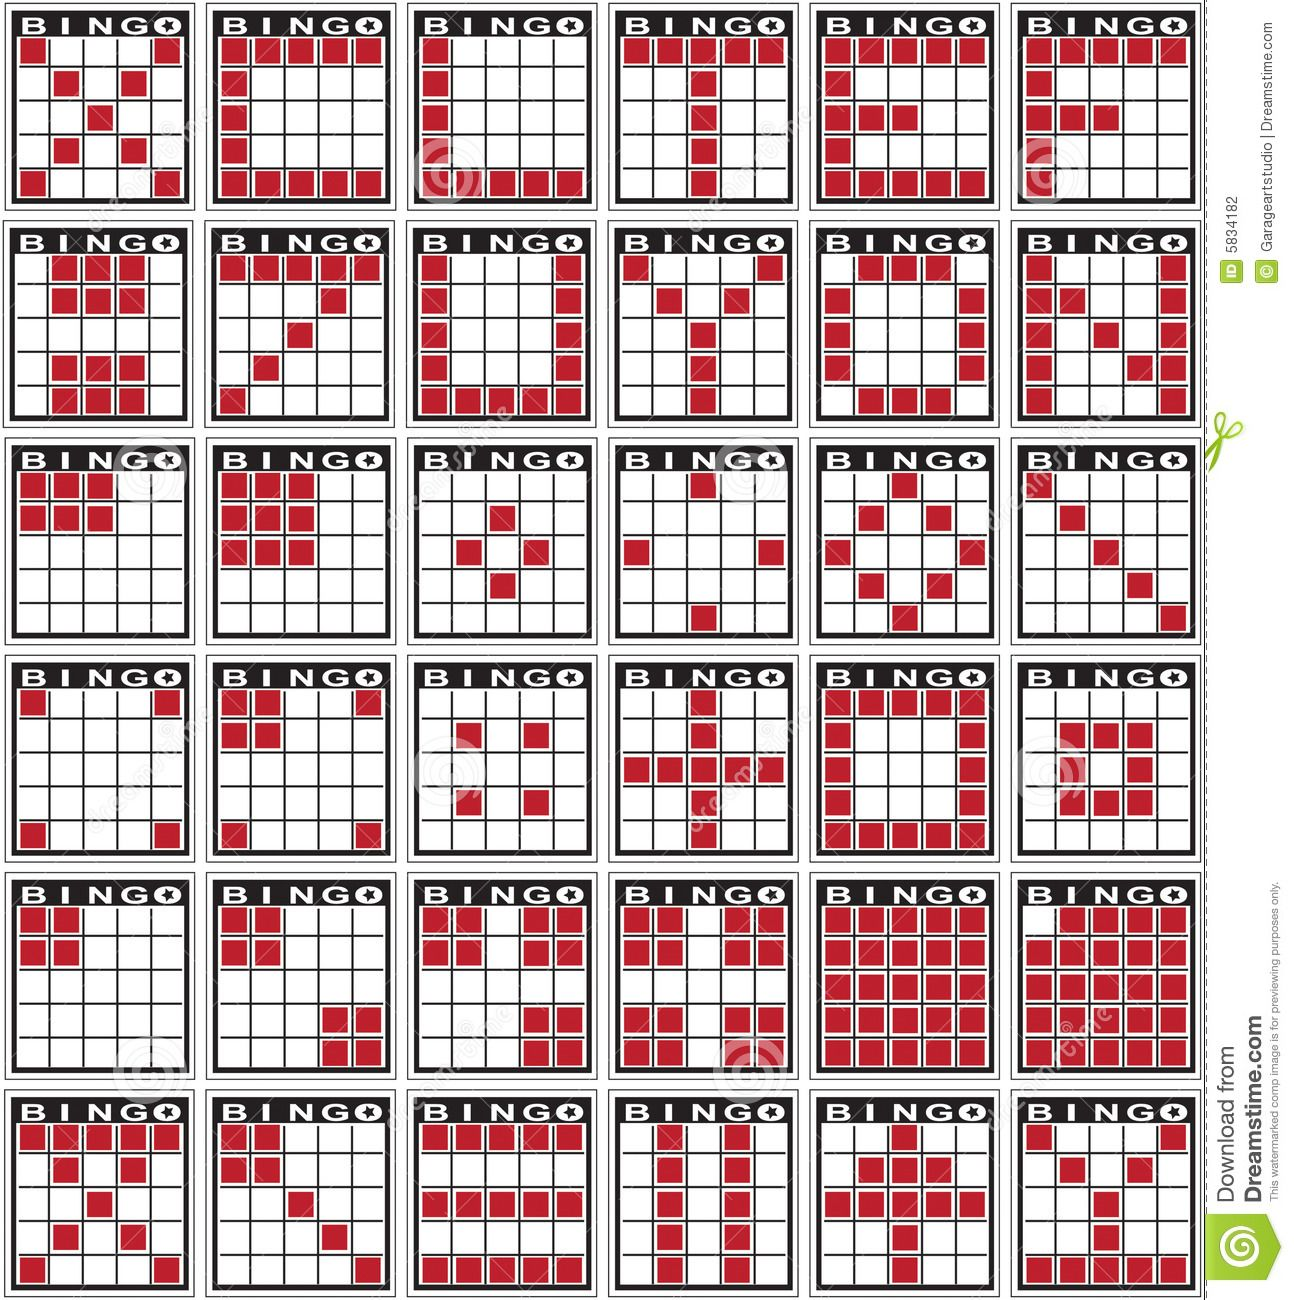 graphic about Bingo Patterns Printable identify Bingo Models Inventory Images - Picture: 5834182 Bingo